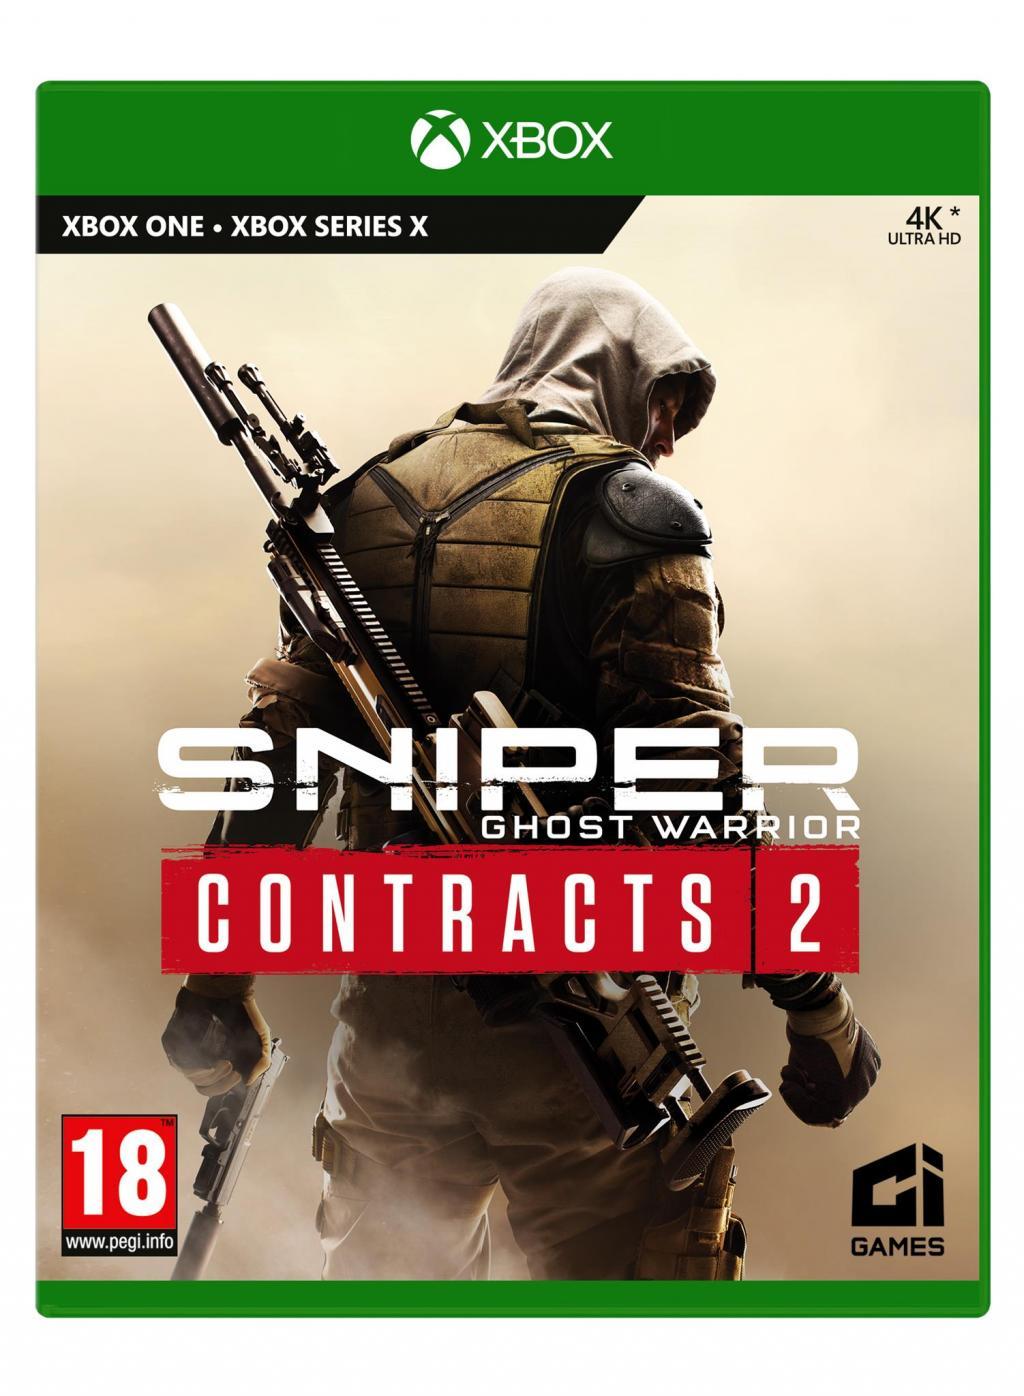 Sniper Ghost Warrior Contracts 2 (BOX UK) XBOX ONE / XBOX SX_1